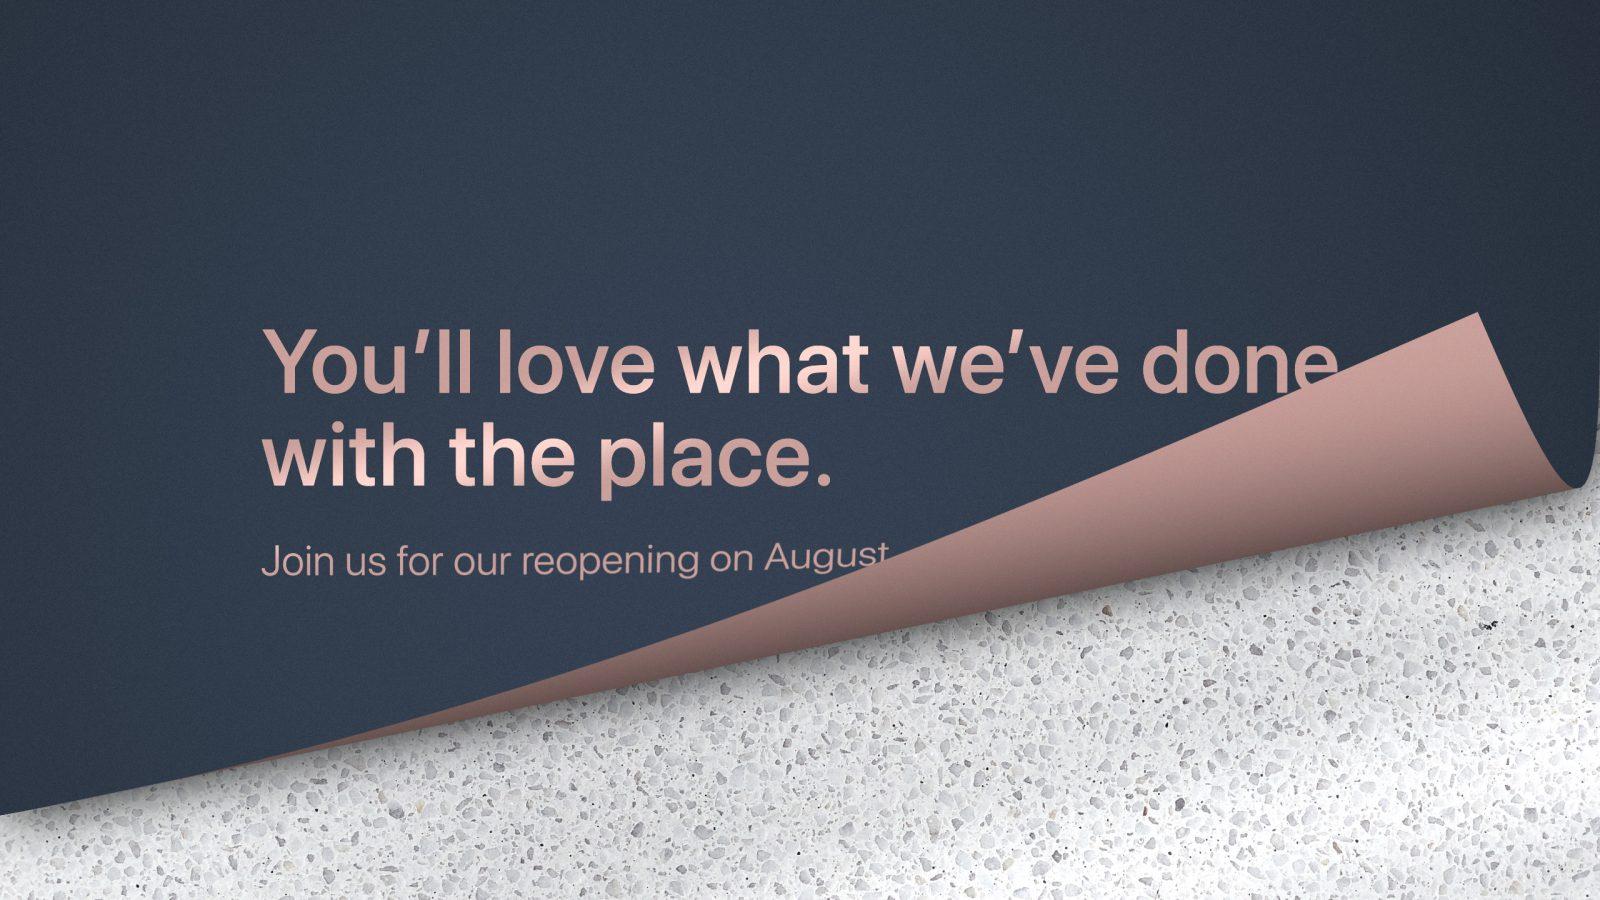 Rebuilt Altamonte Springs Apple Store opens August 31st